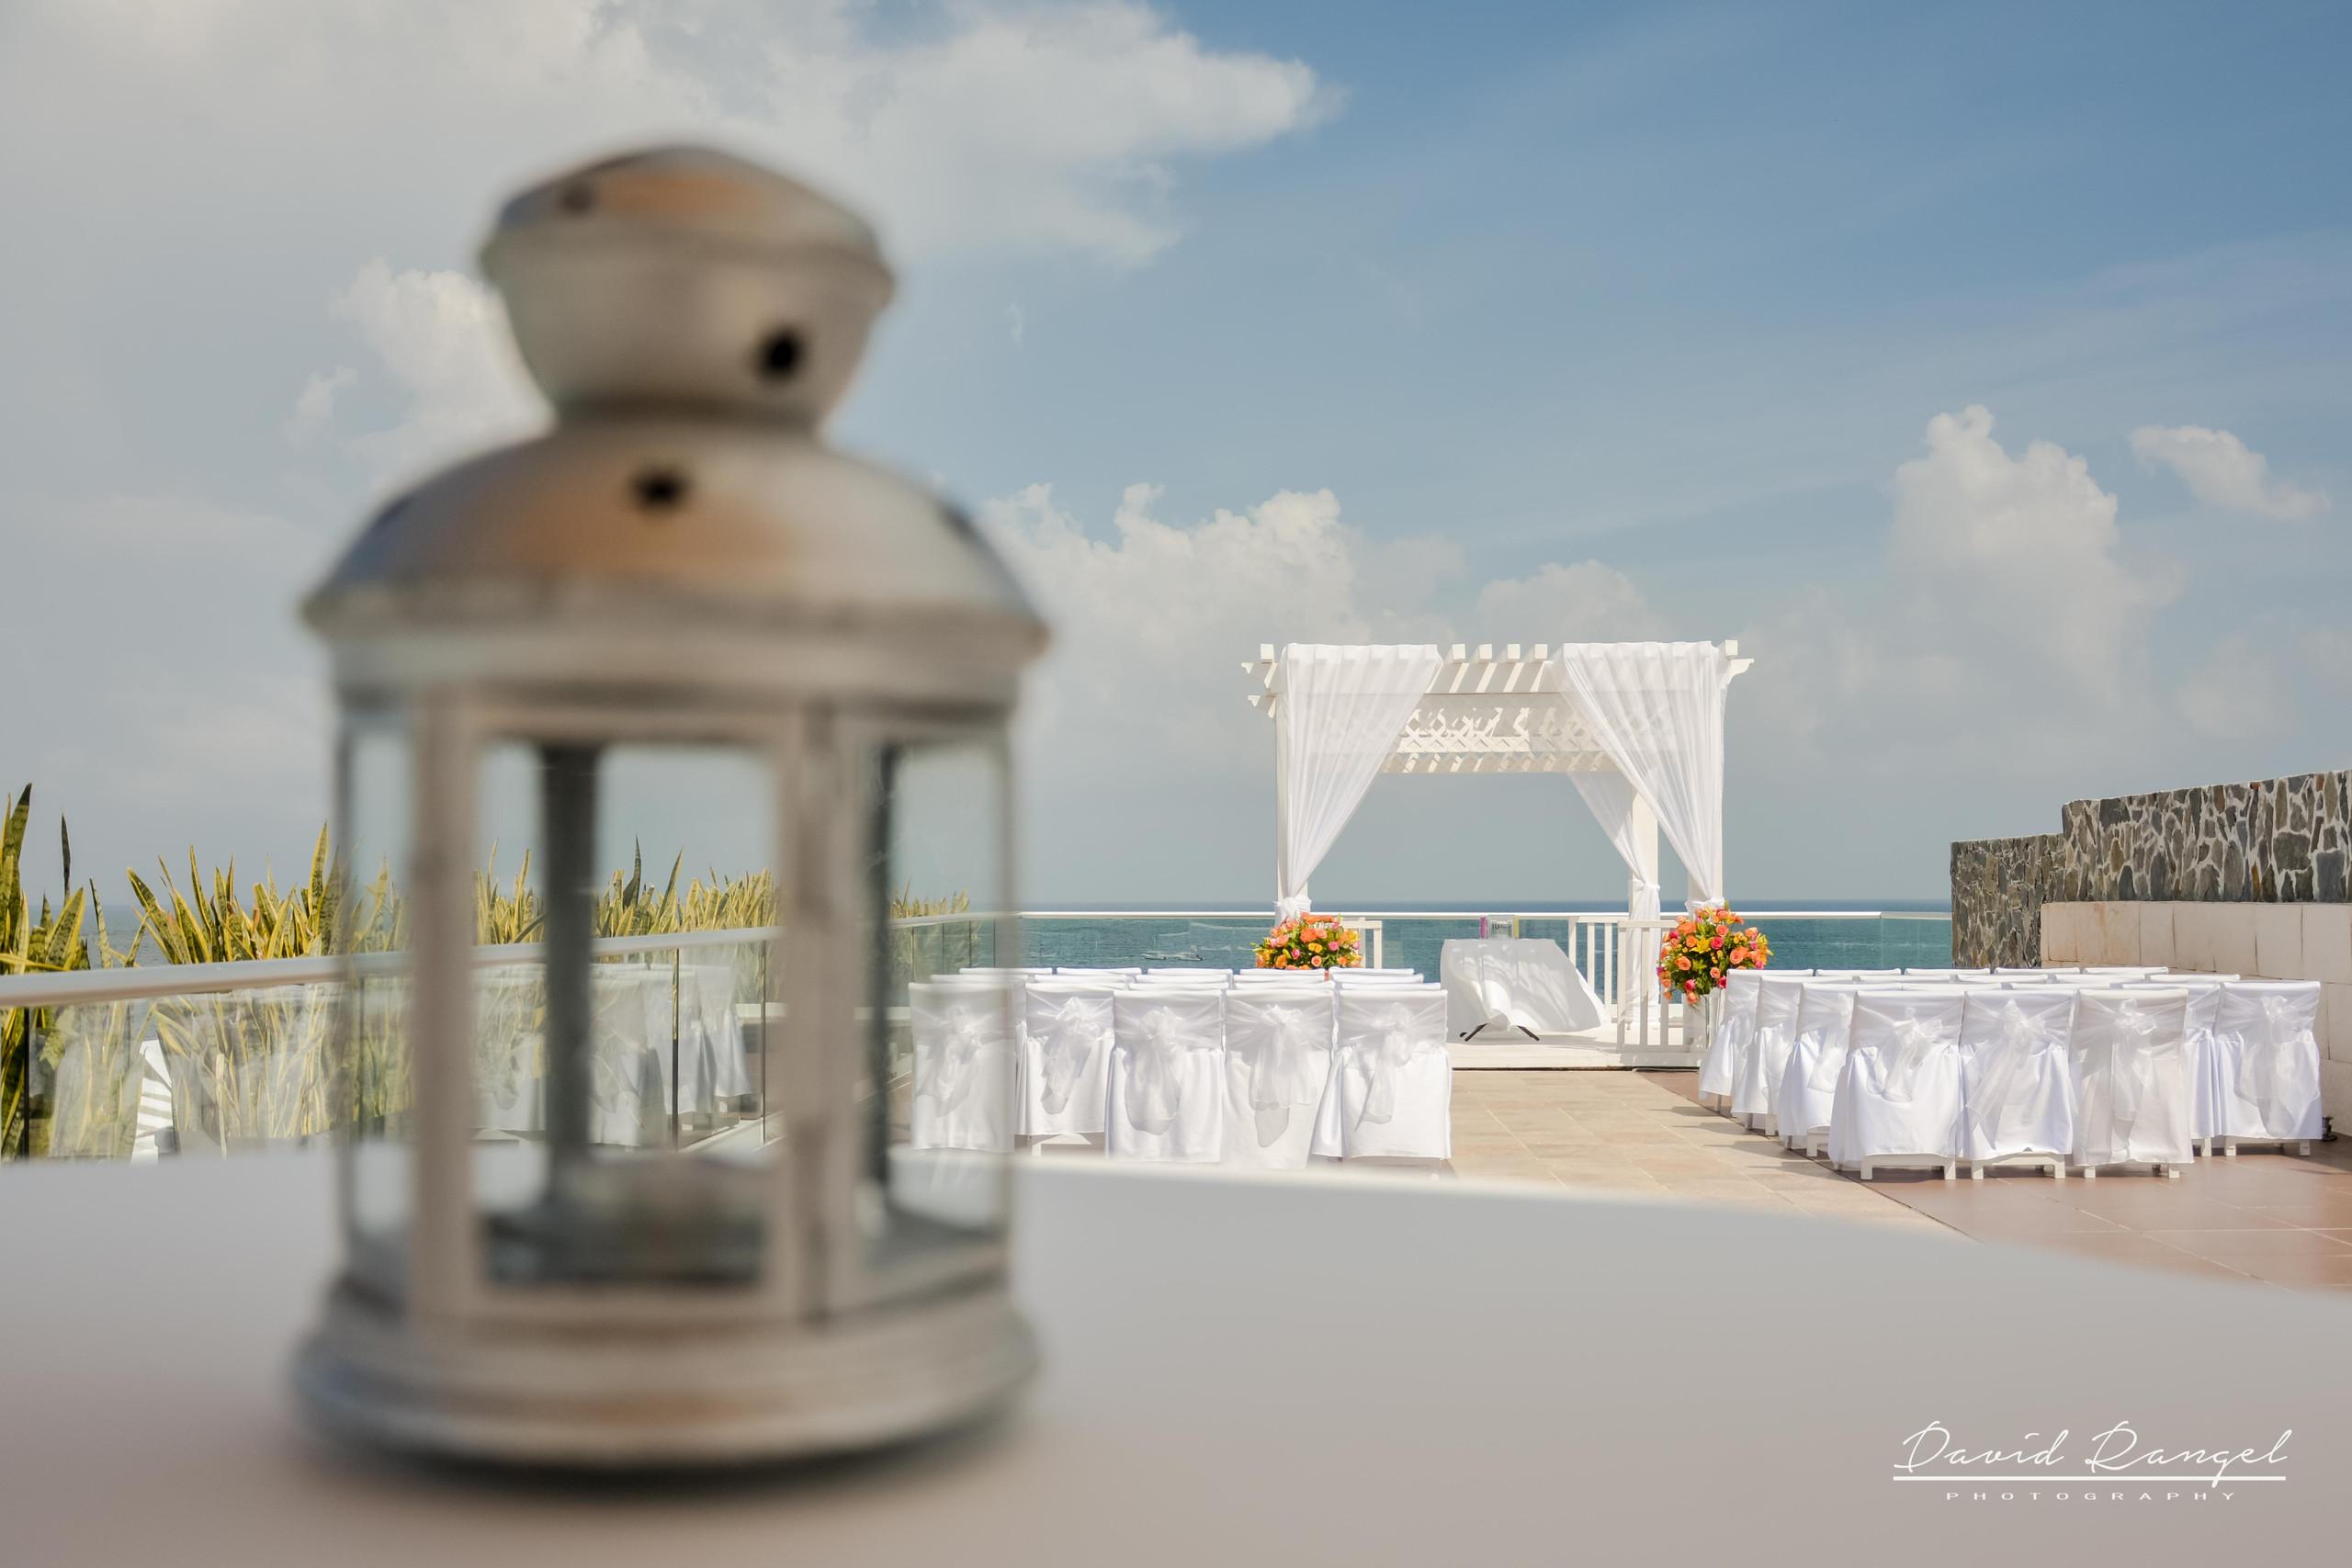 Wedding Gazebo, sky deck